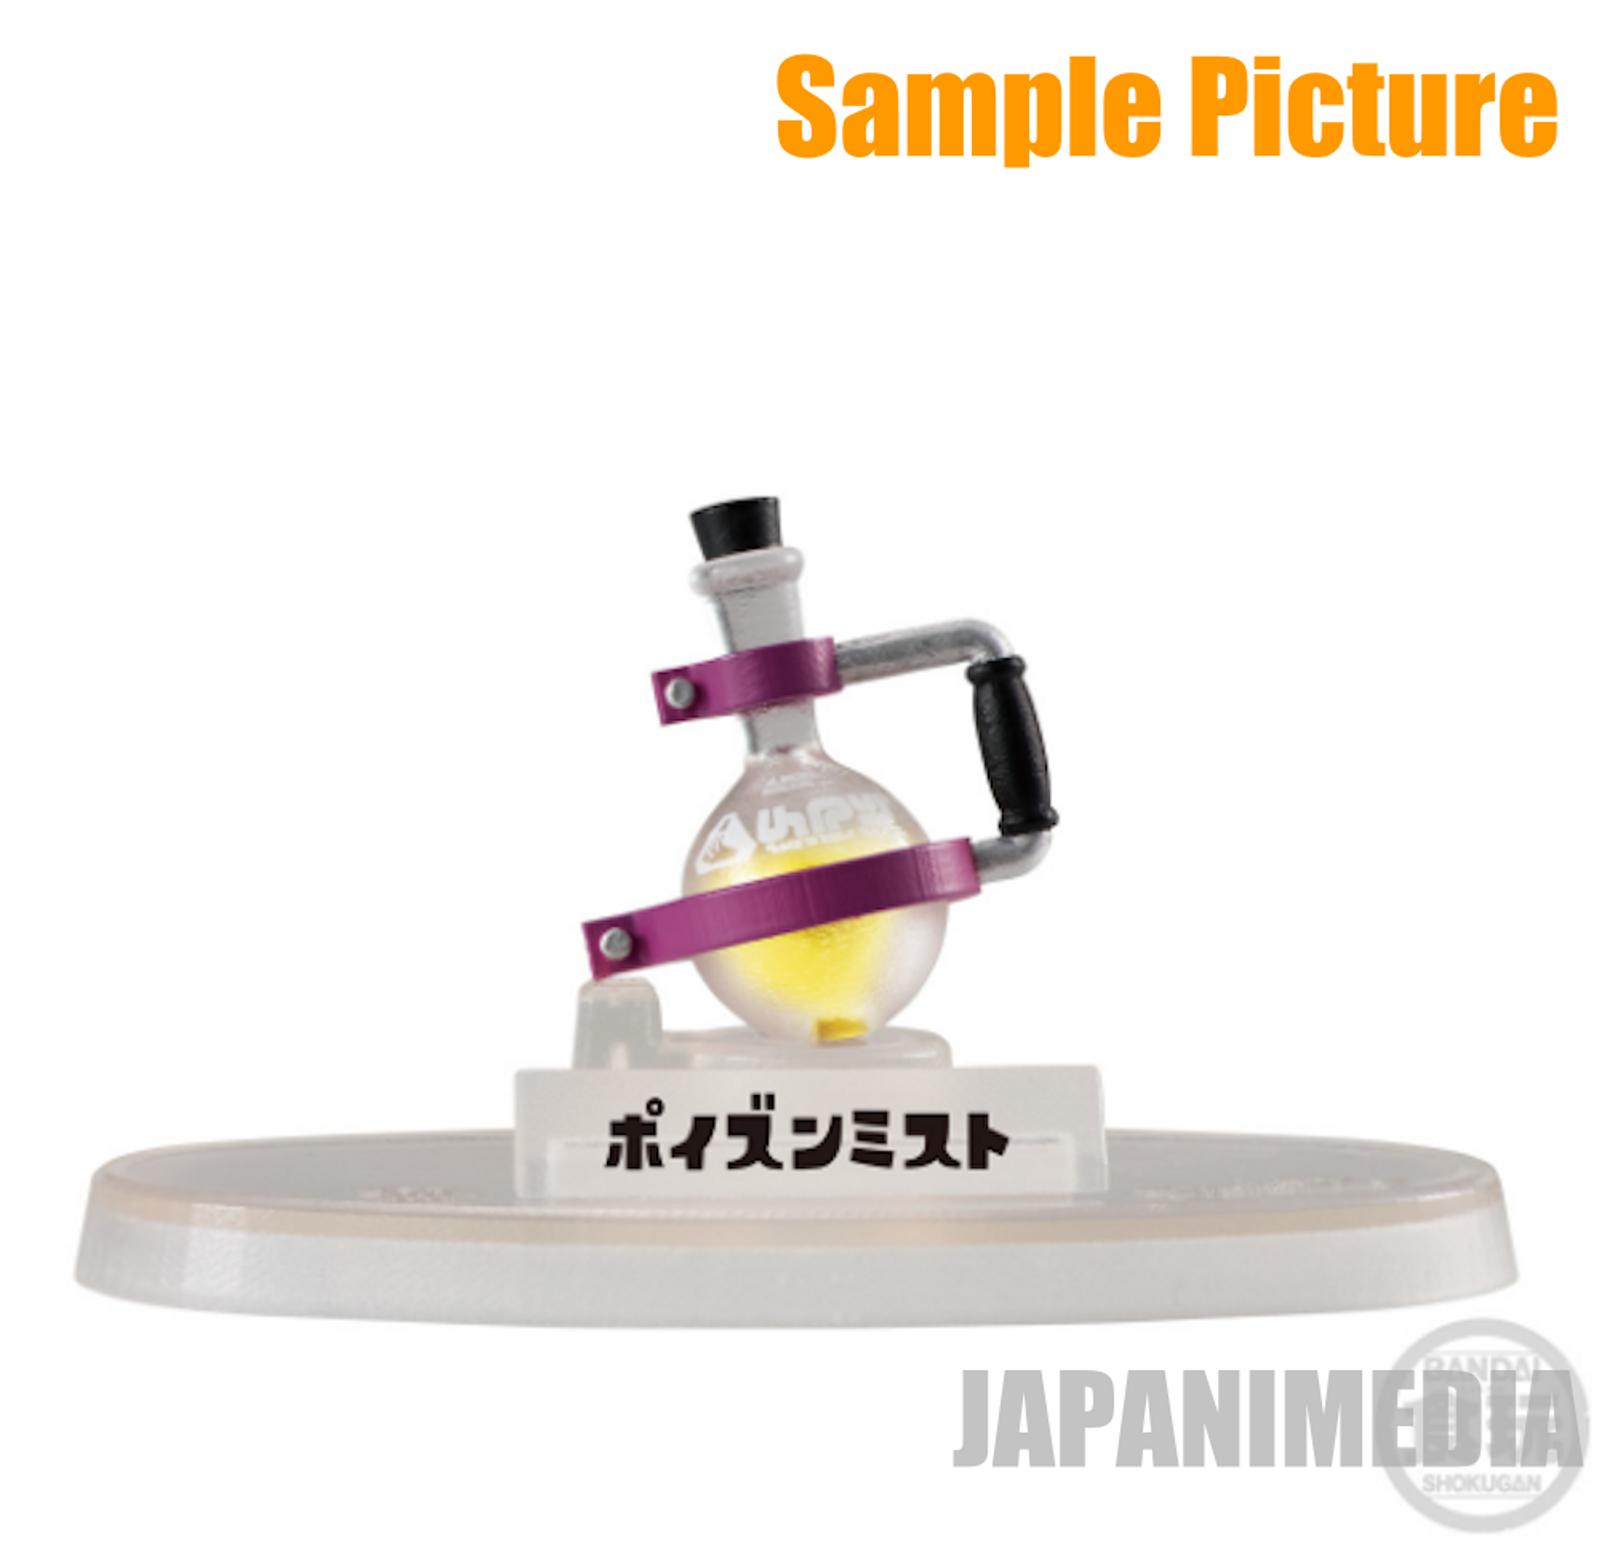 Splatoon 2 Toxic Mist Sub Weapon Figure Collection JAPAN Nintendo Switch